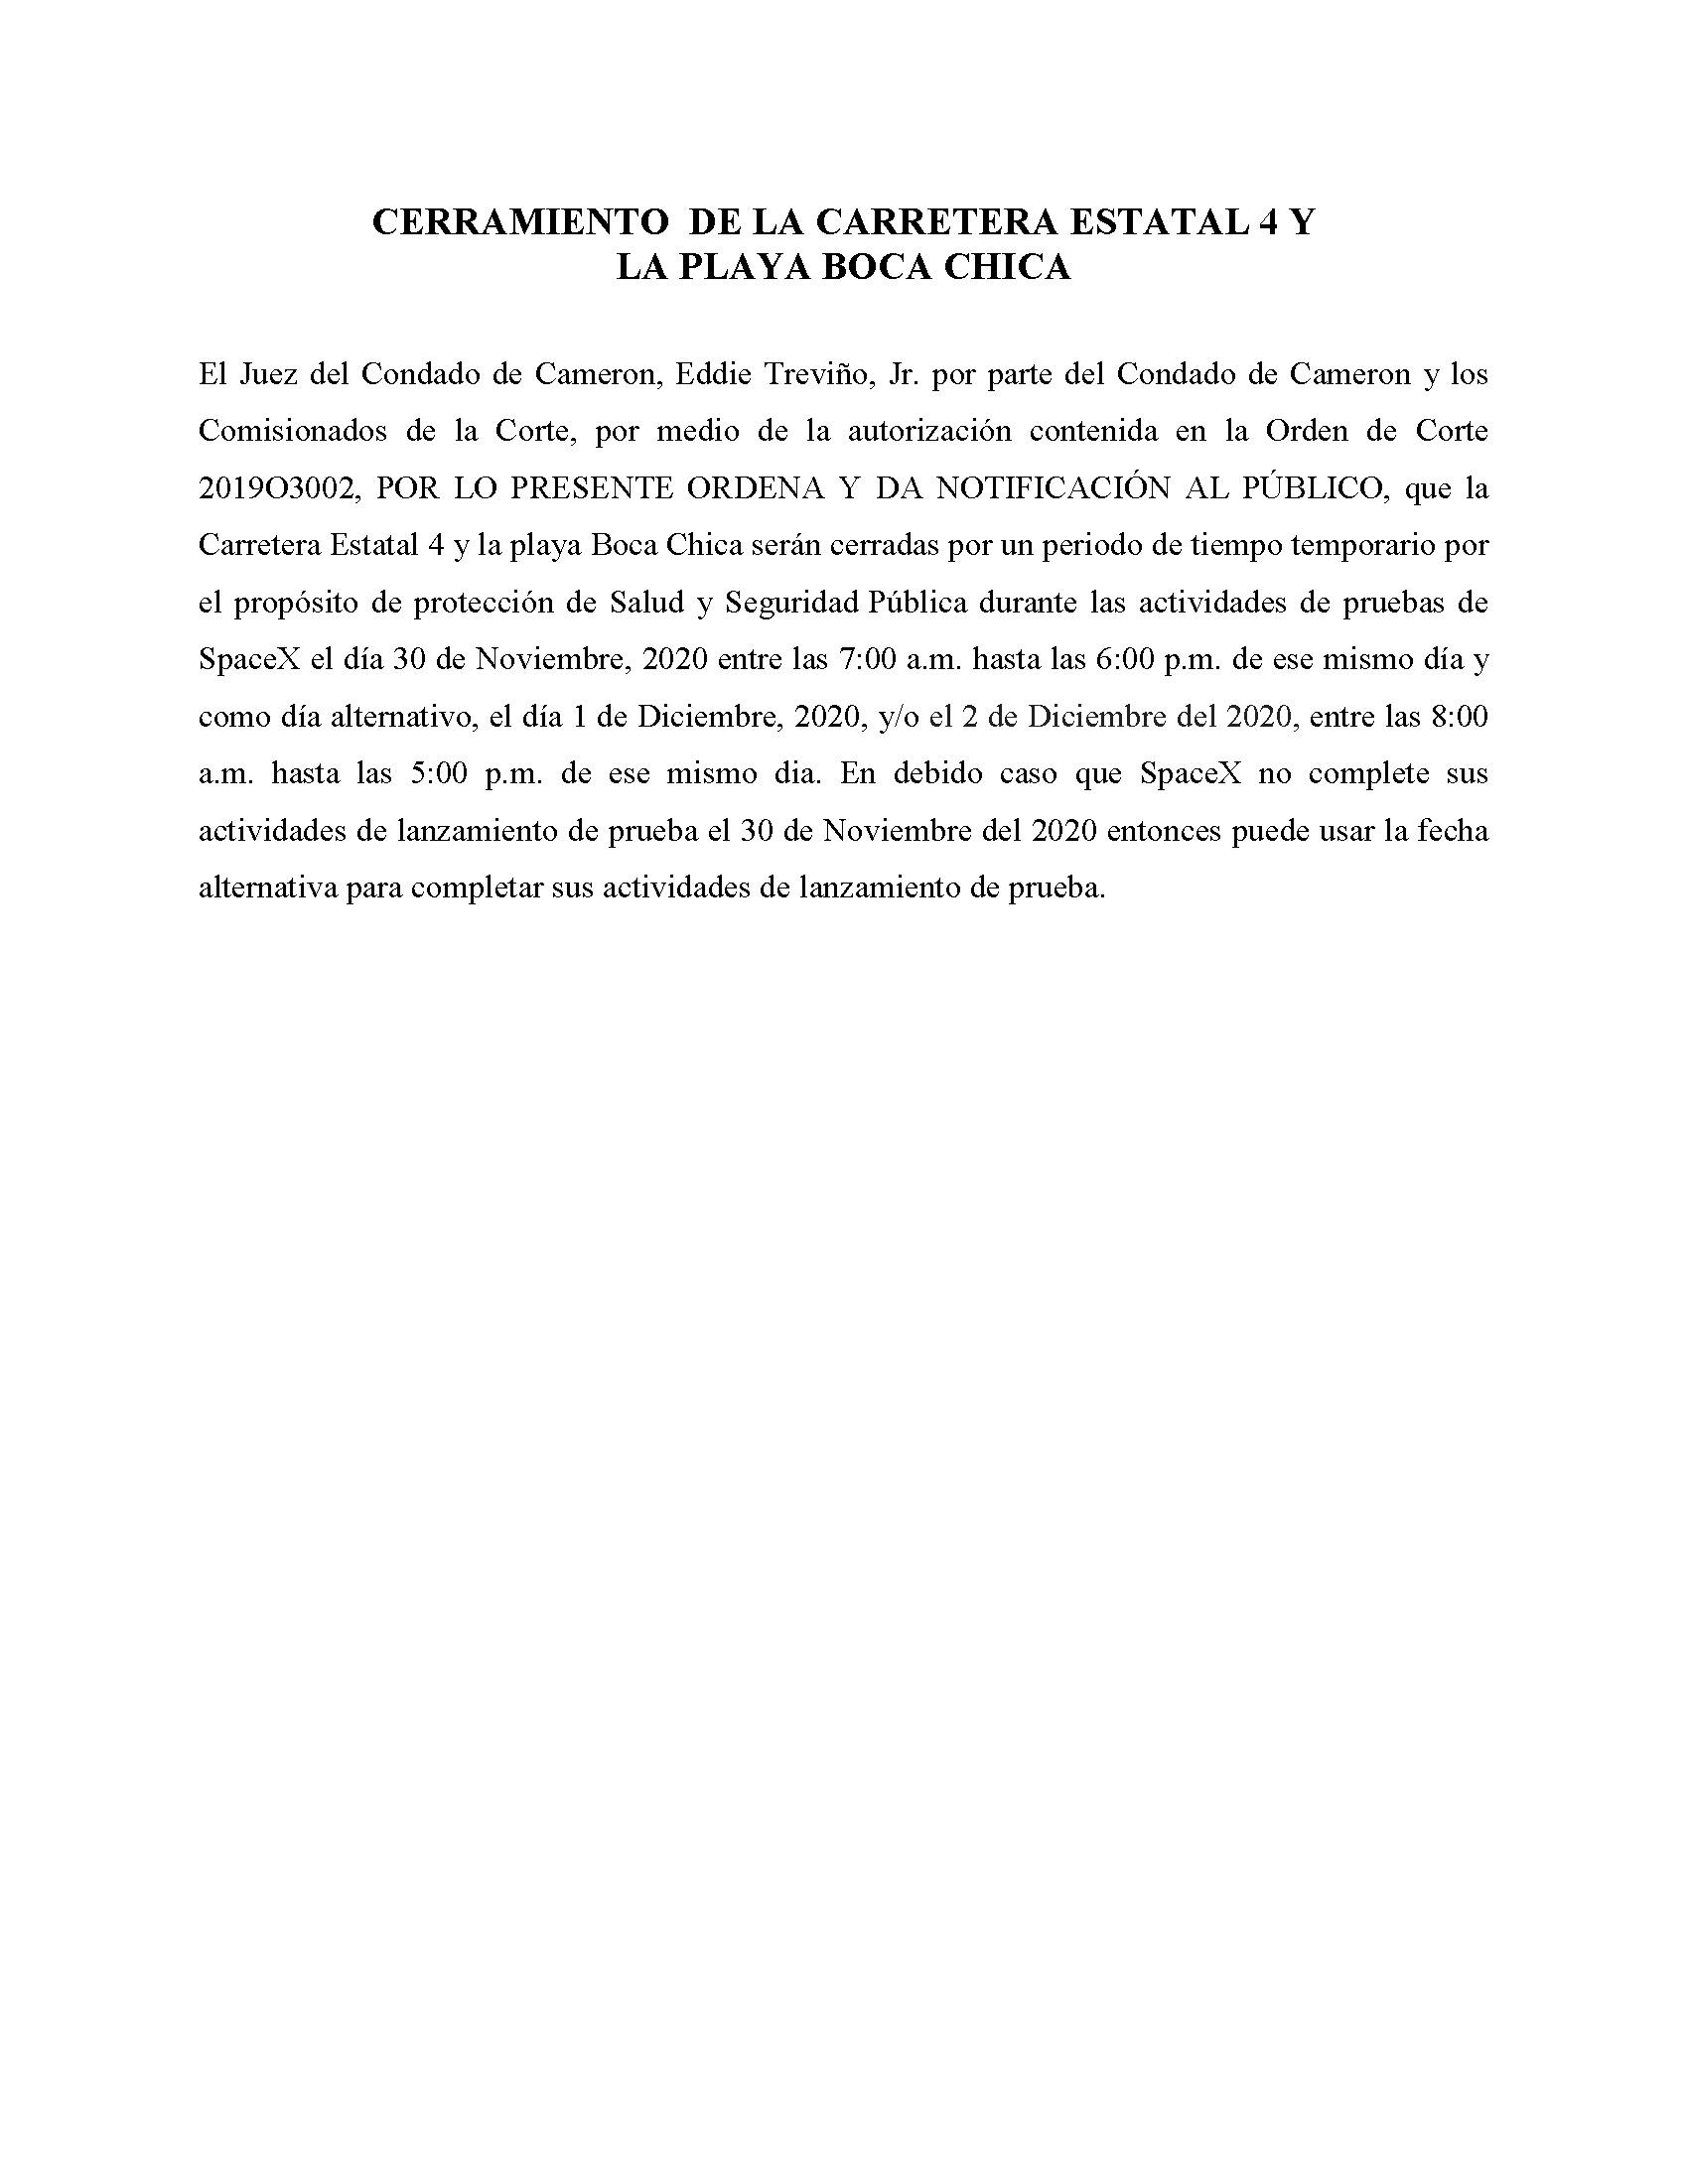 ORDER.CLOSURE OF HIGHWAY 4 Y LA PLAYA BOCA CHICA.SPANISH.11.30.20 2